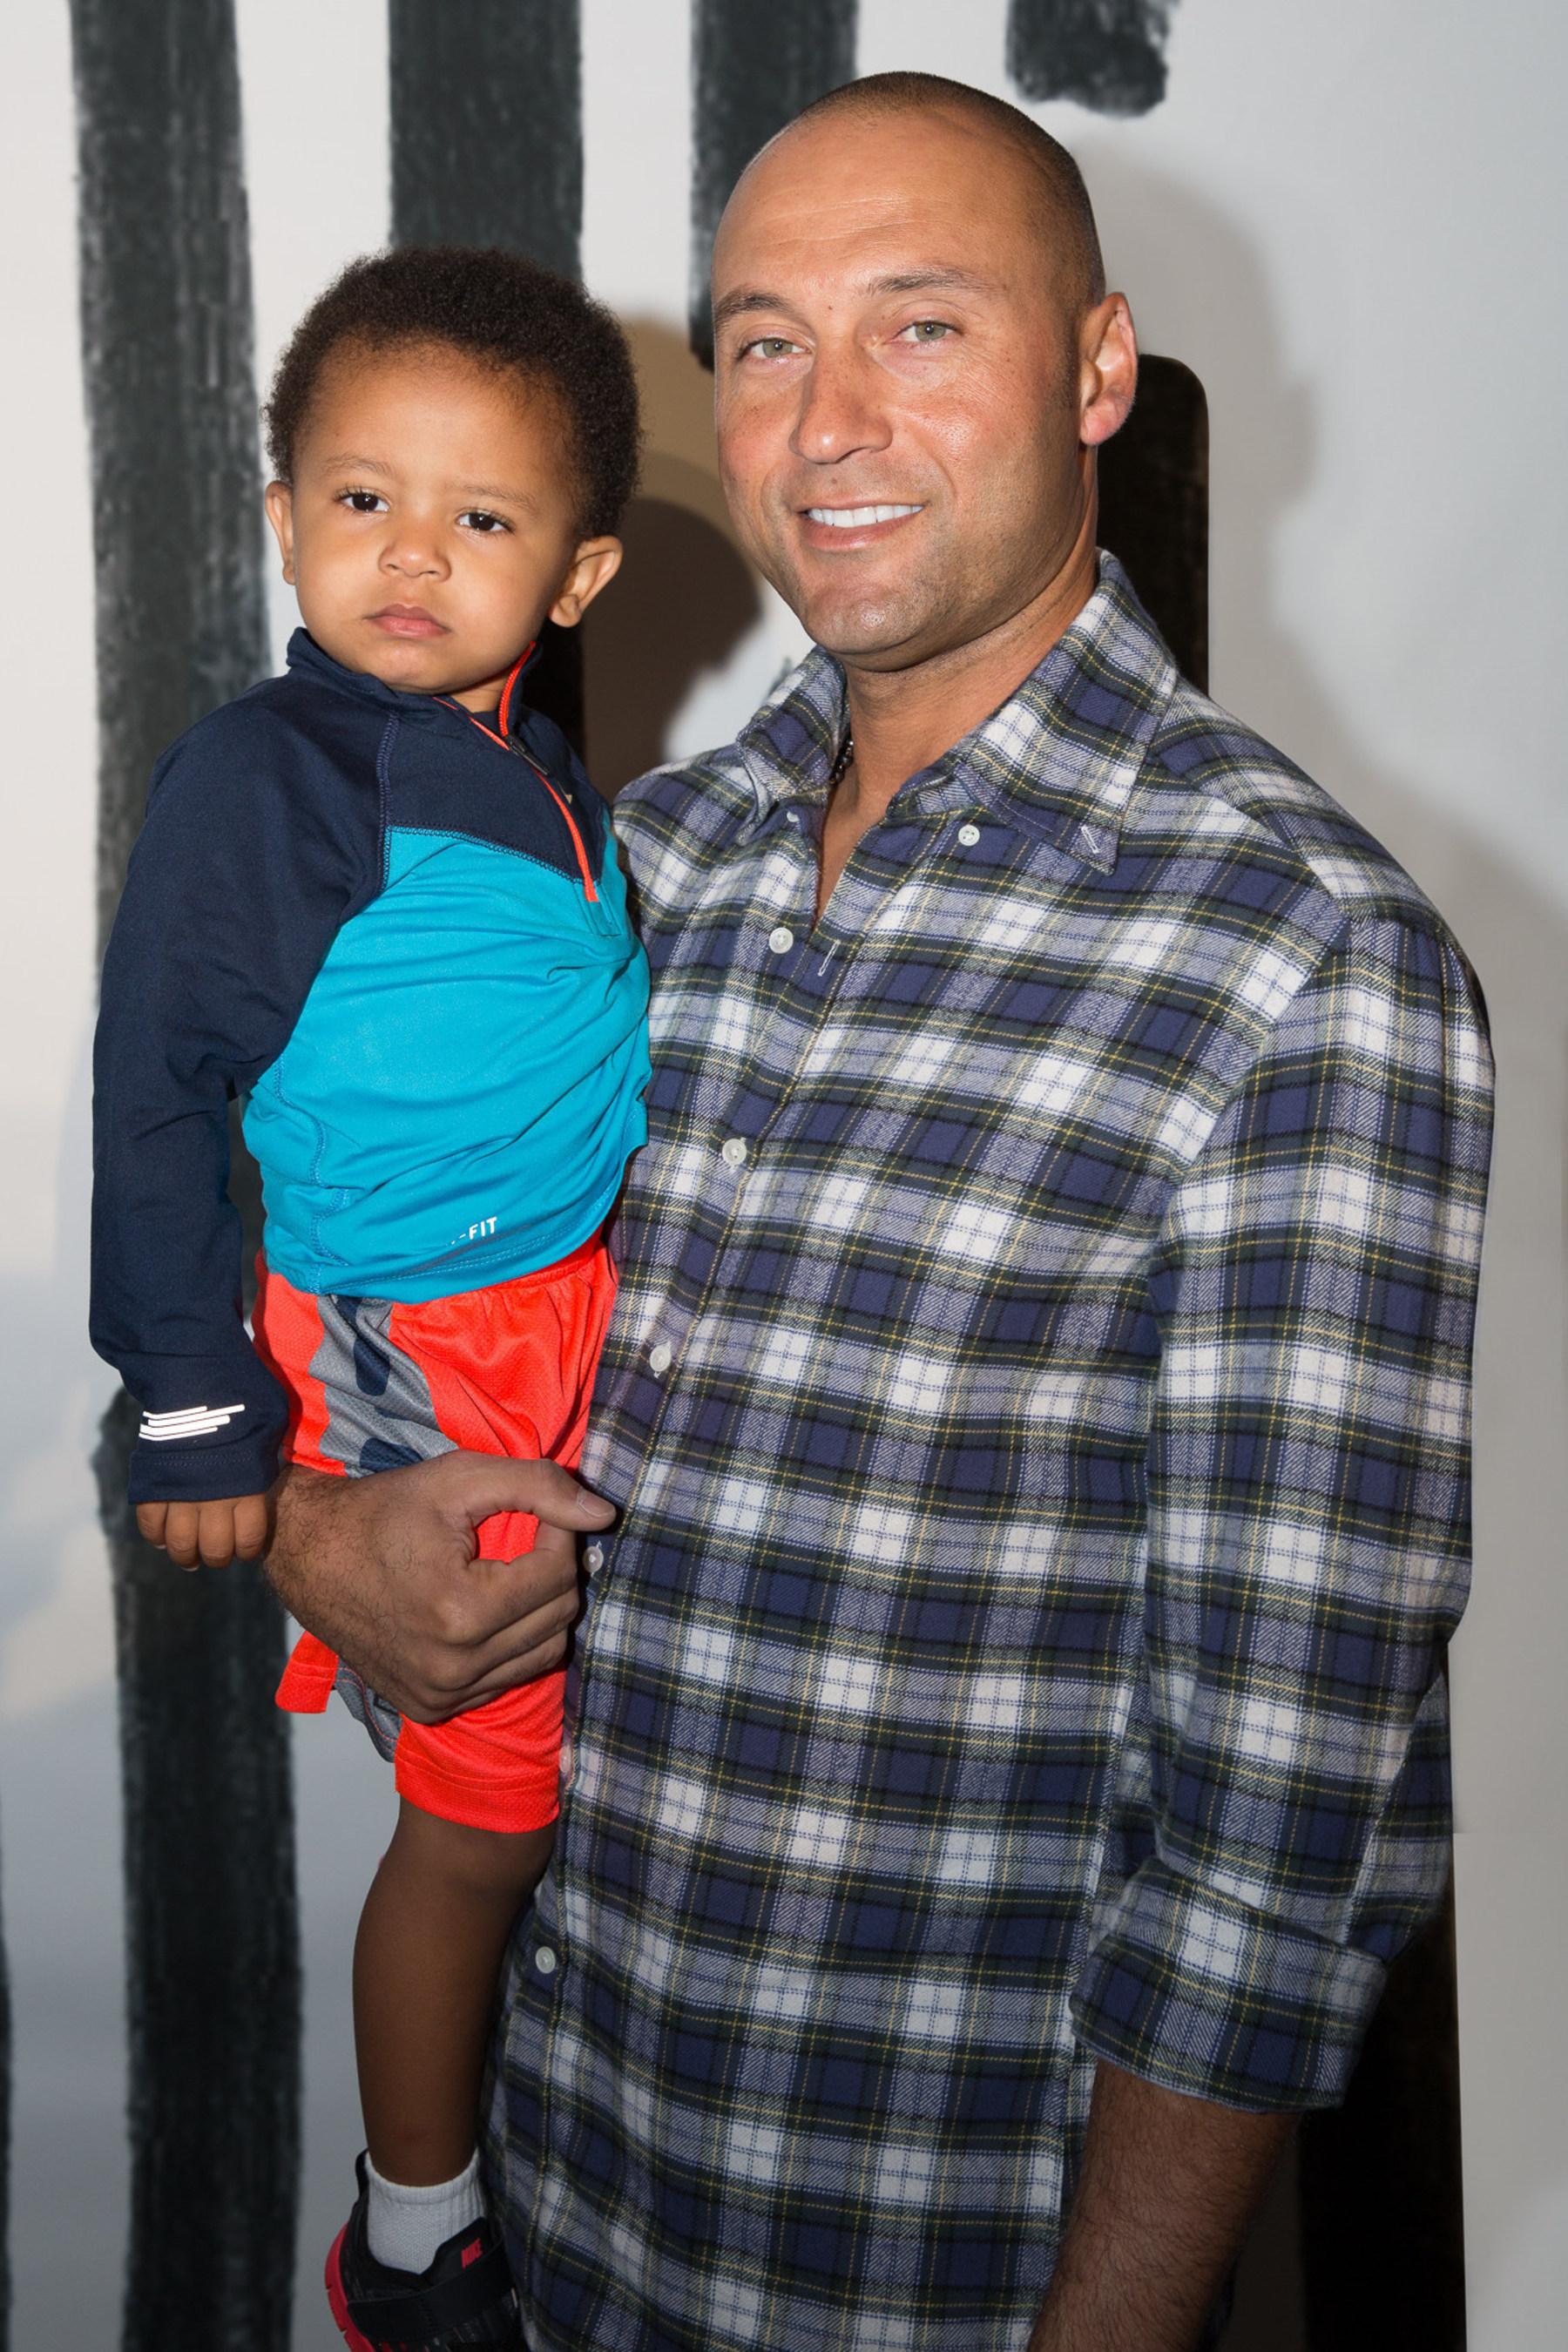 Derek Jeter and his nephew at the Kids Rock! Fashion Show (PRNewsFoto/Haddad Brands)